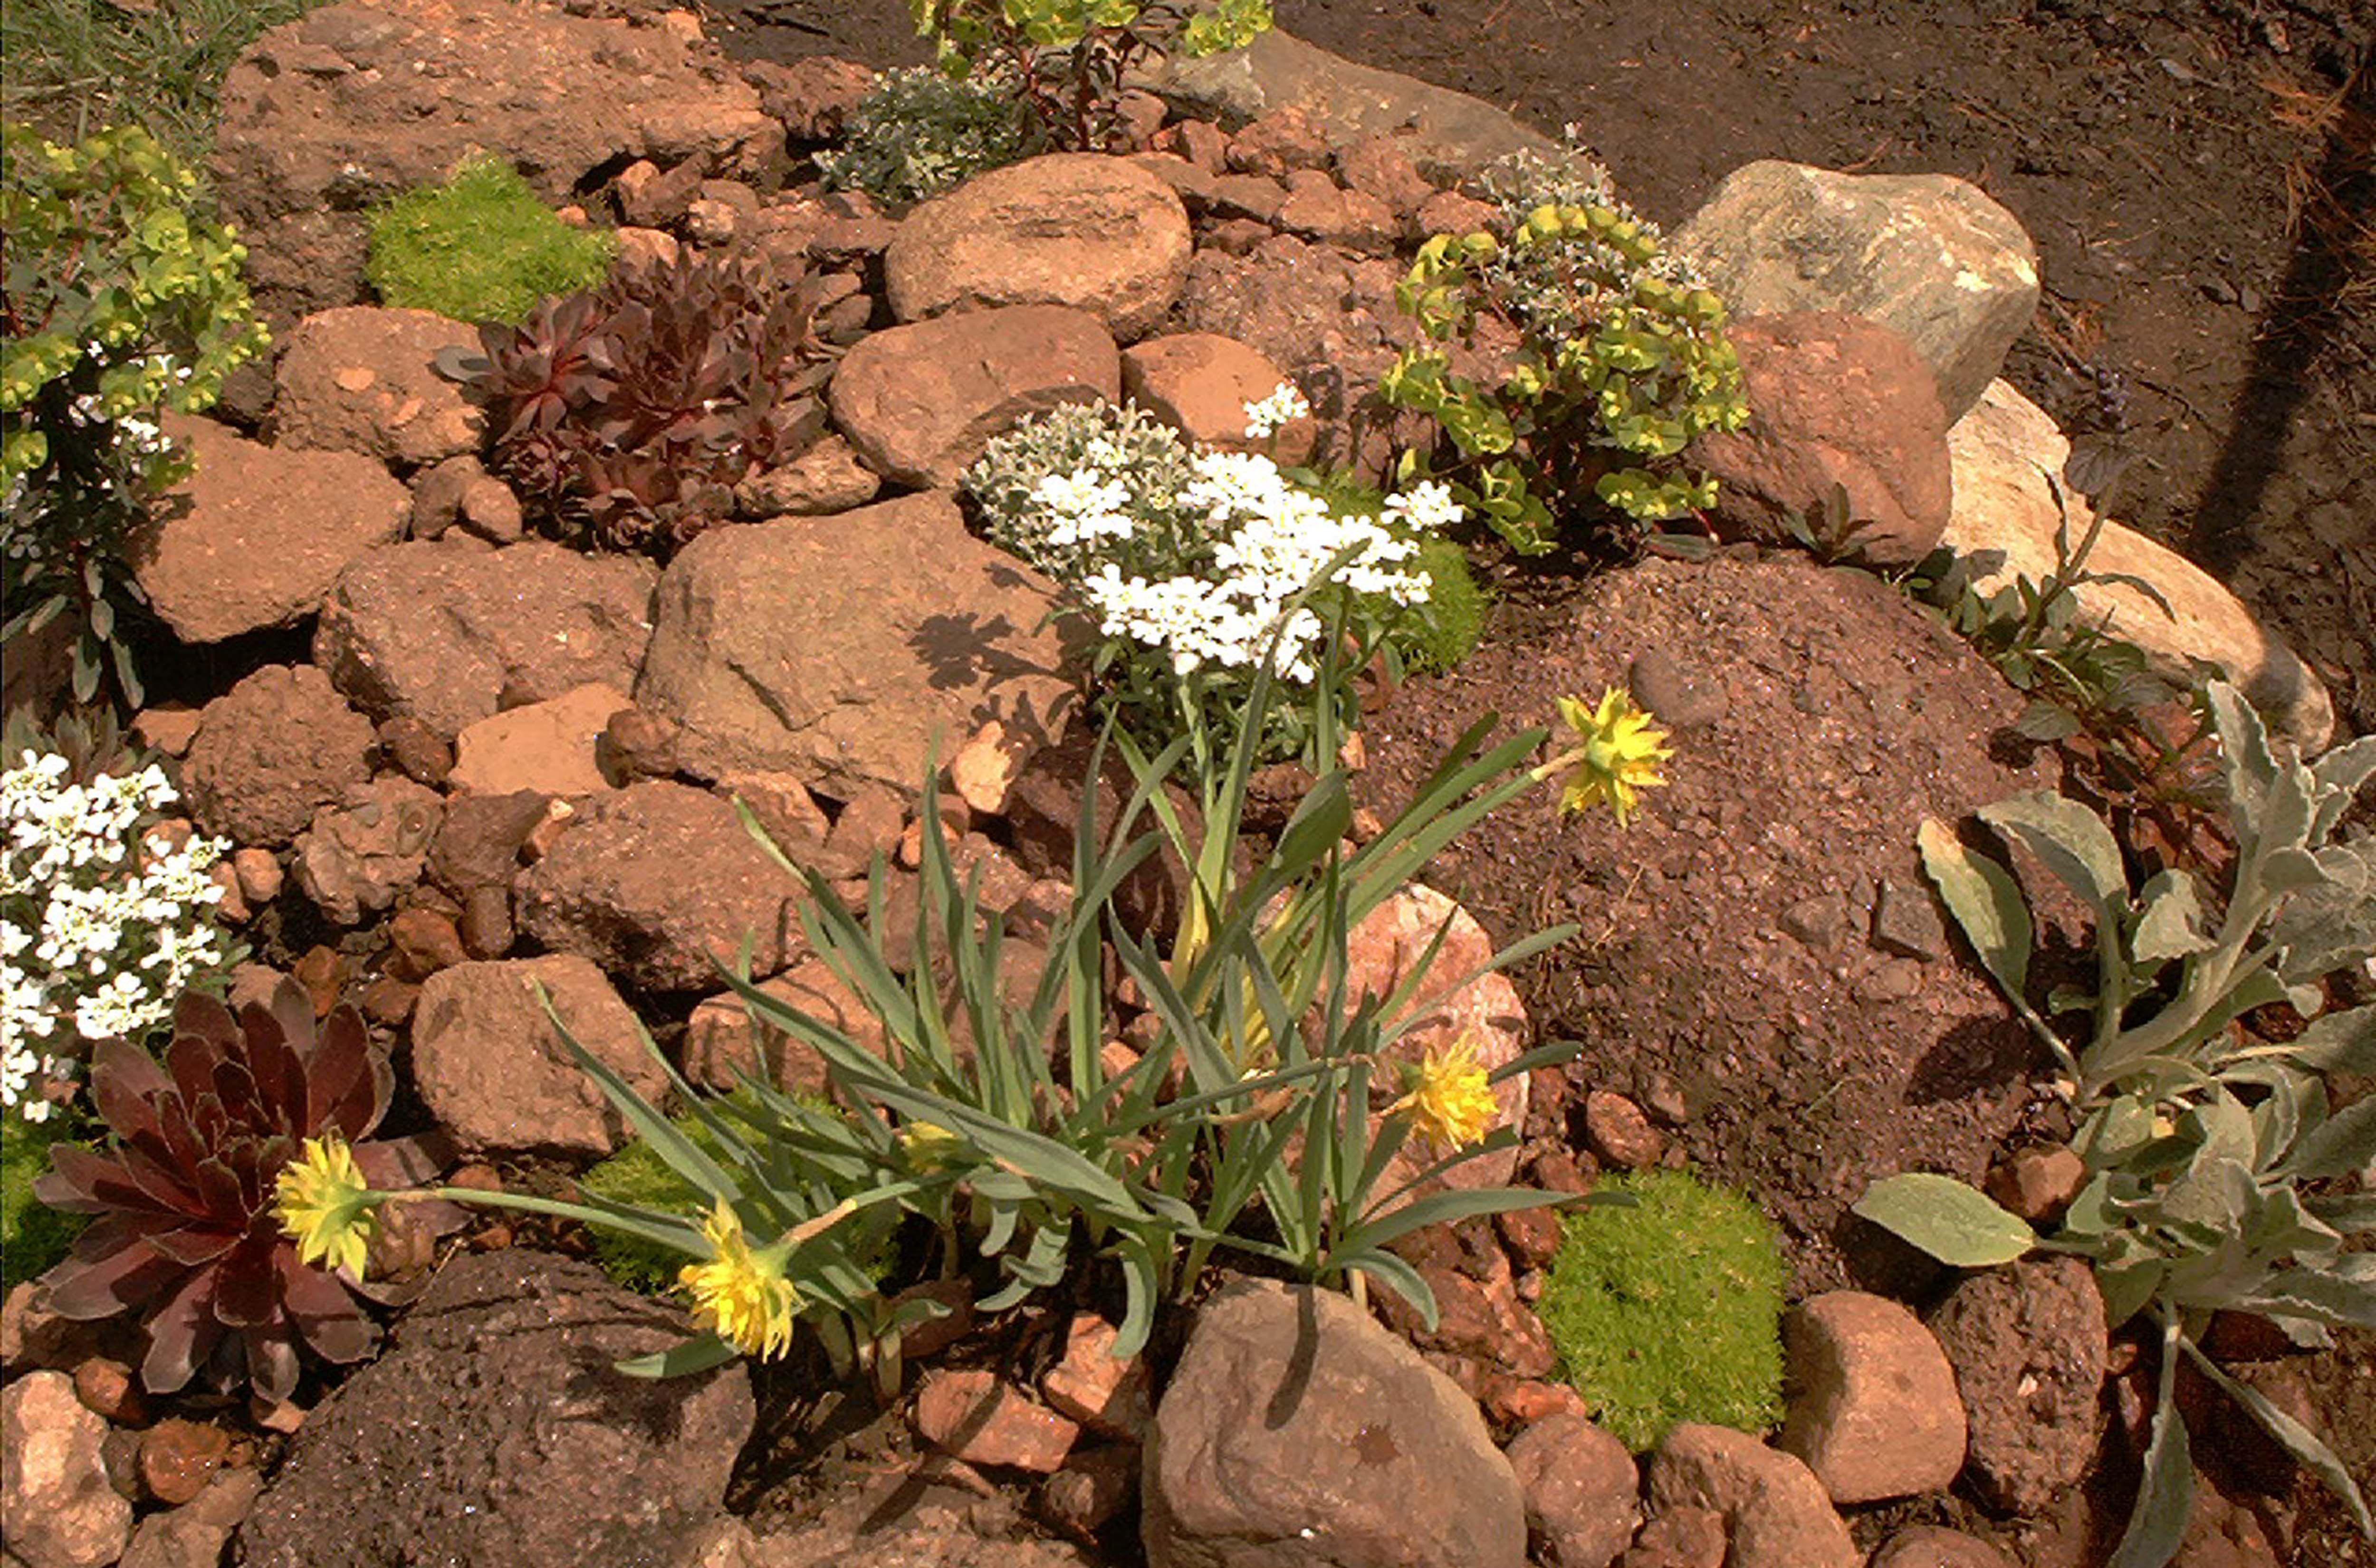 How to Build Rock Gardens Tutorial